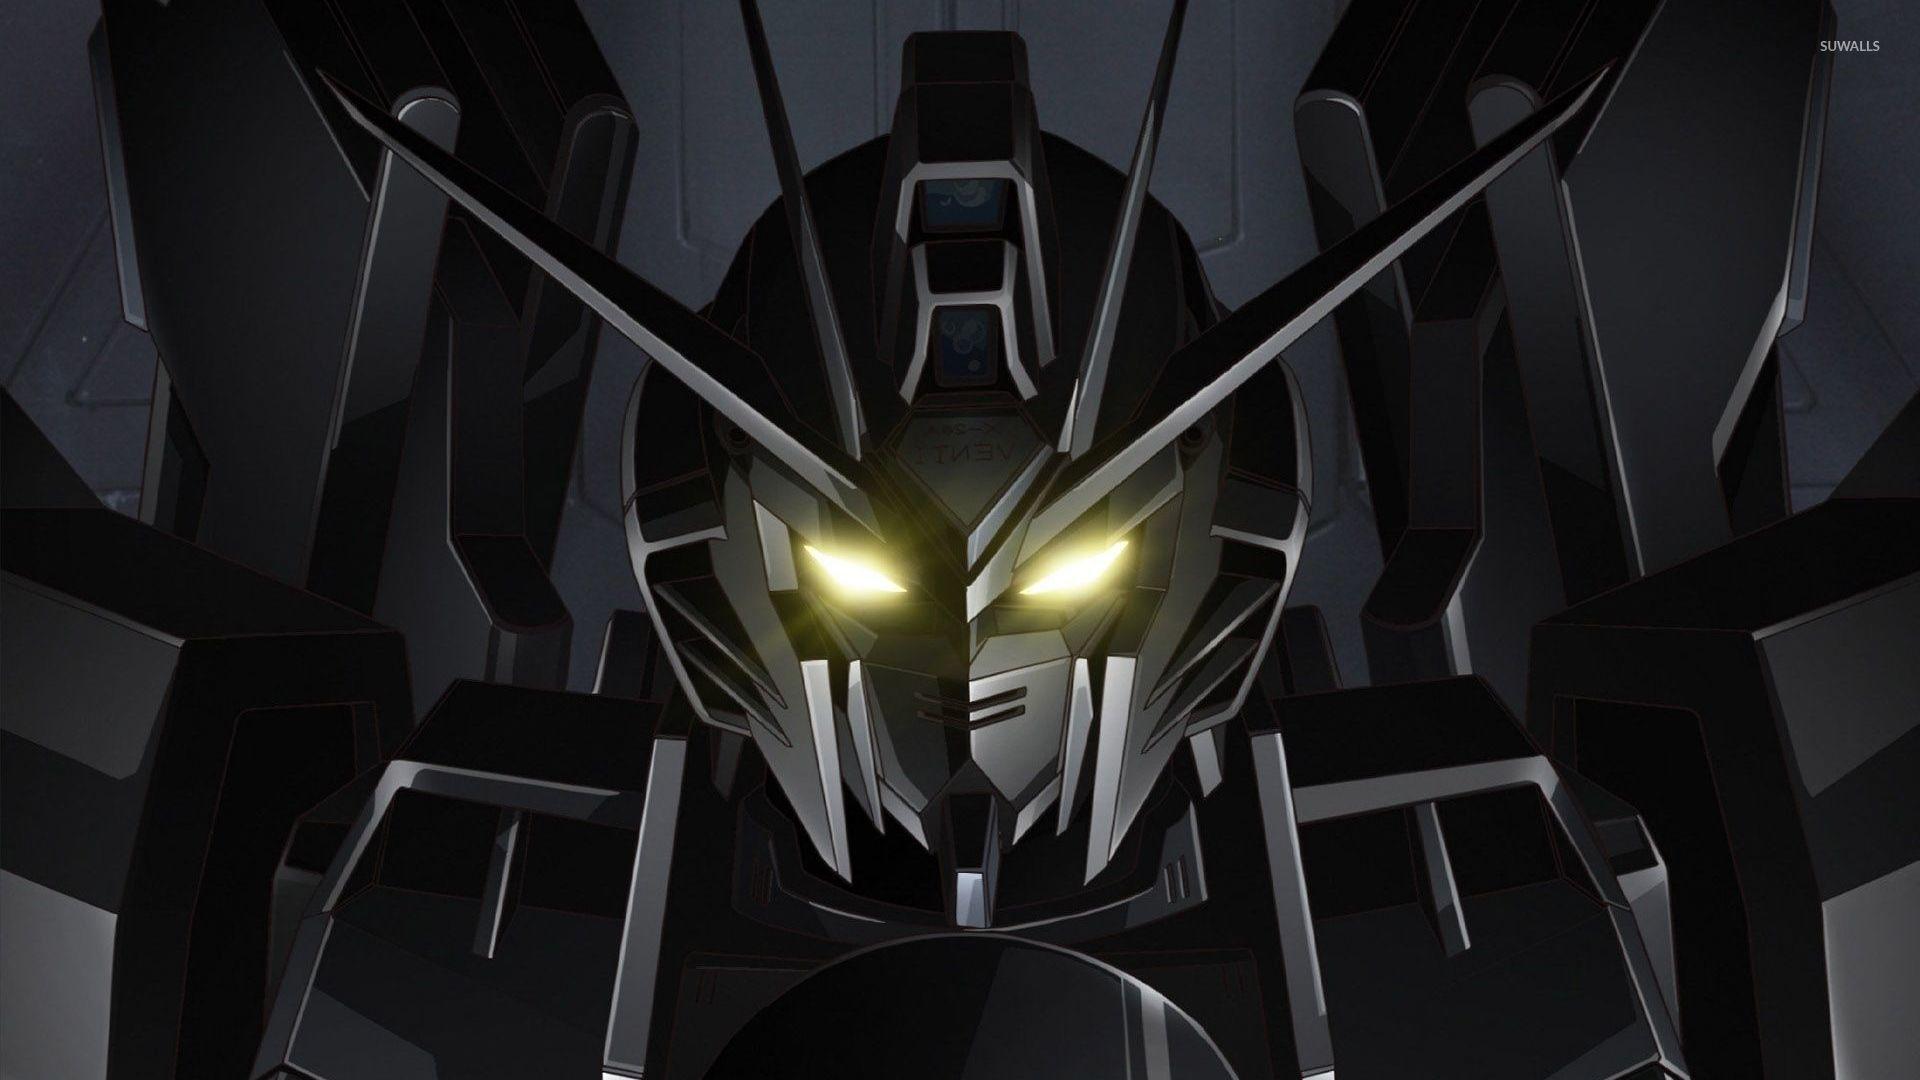 ZGMF X20A Strike Freedom Gundam Wallpaper Anime